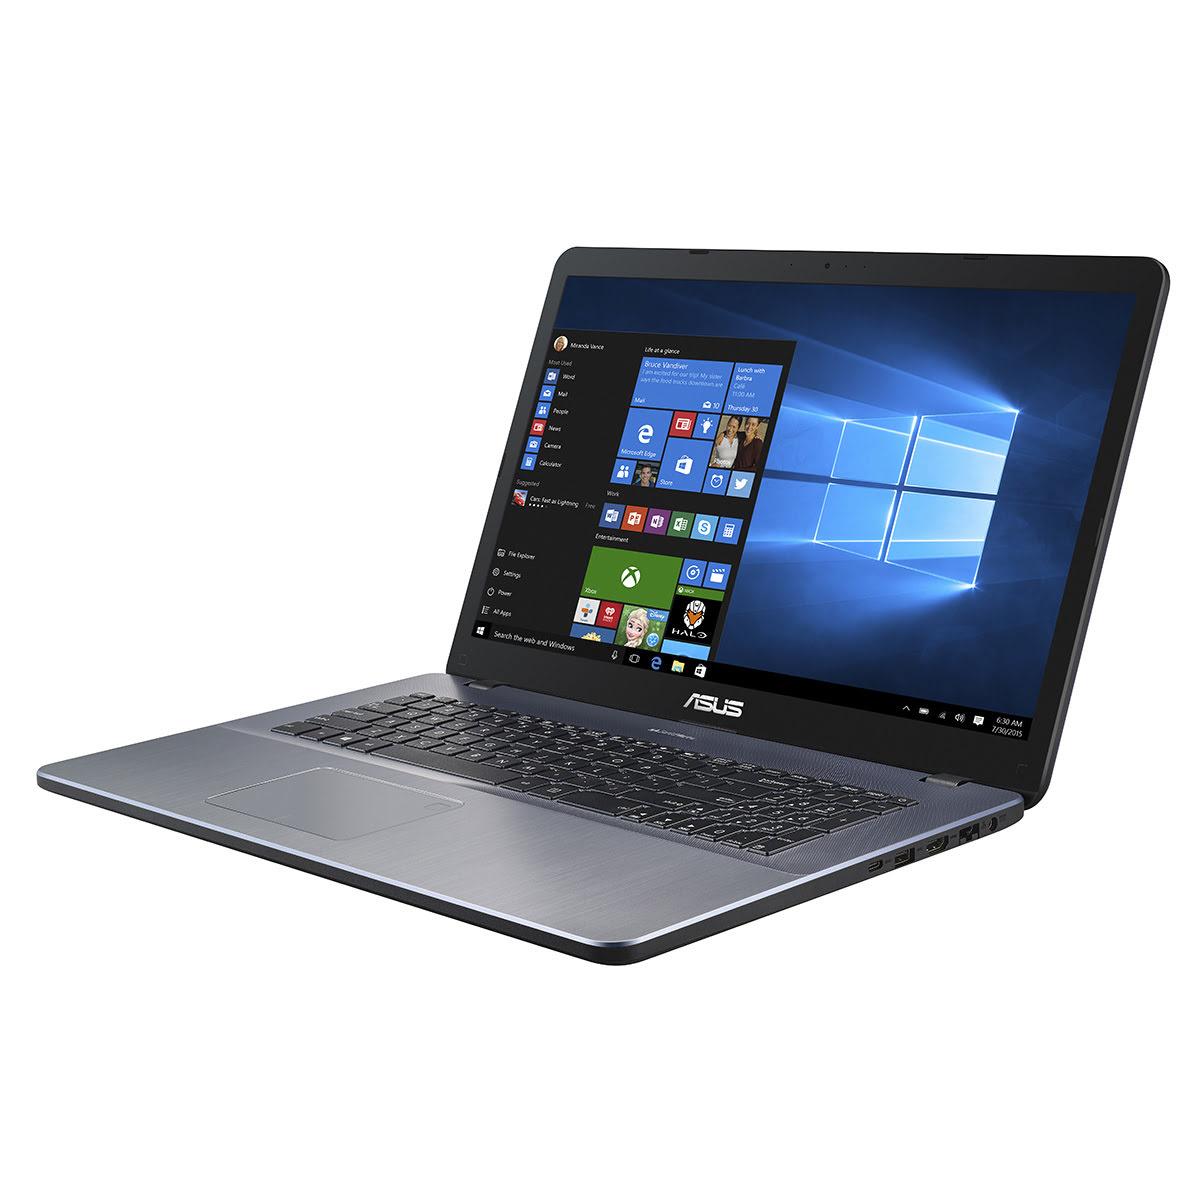 Asus 90NB0EV1-M04870 - PC portable Asus - Cybertek.fr - 3